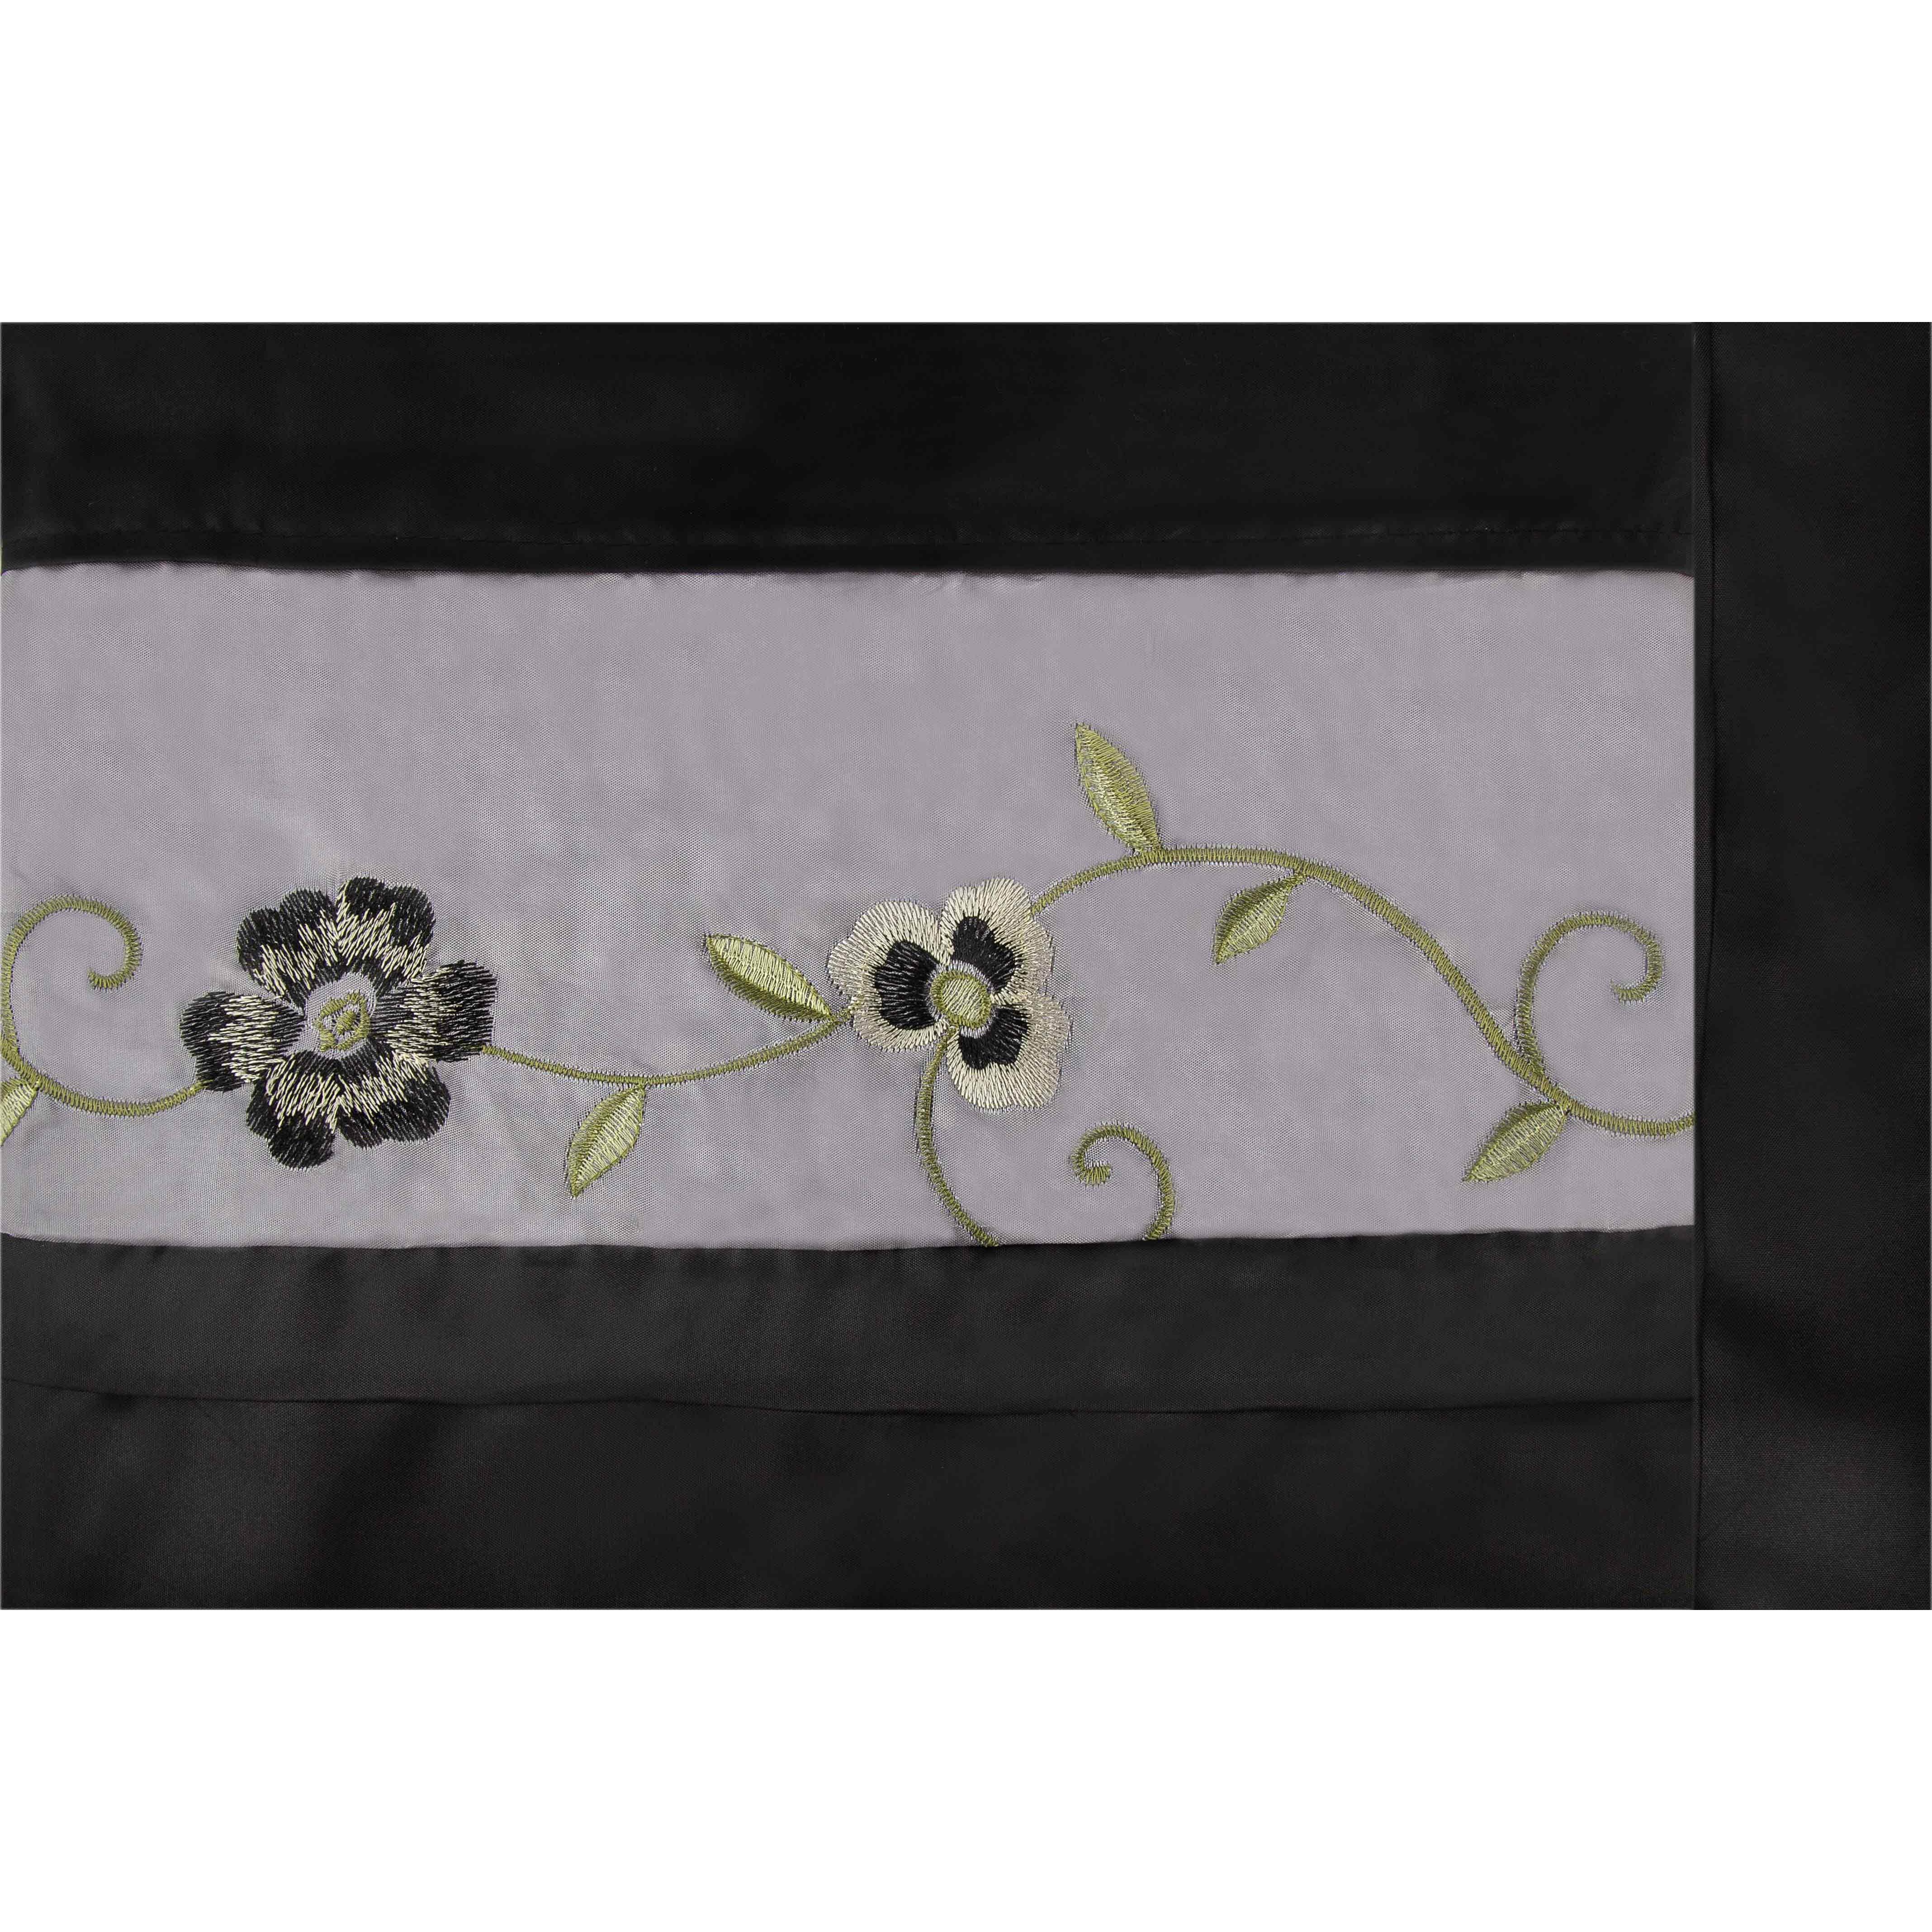 crover 15 piece floral bath mat and shower curtain set contemporary bath shower curtain 15 pcs modern bathroom